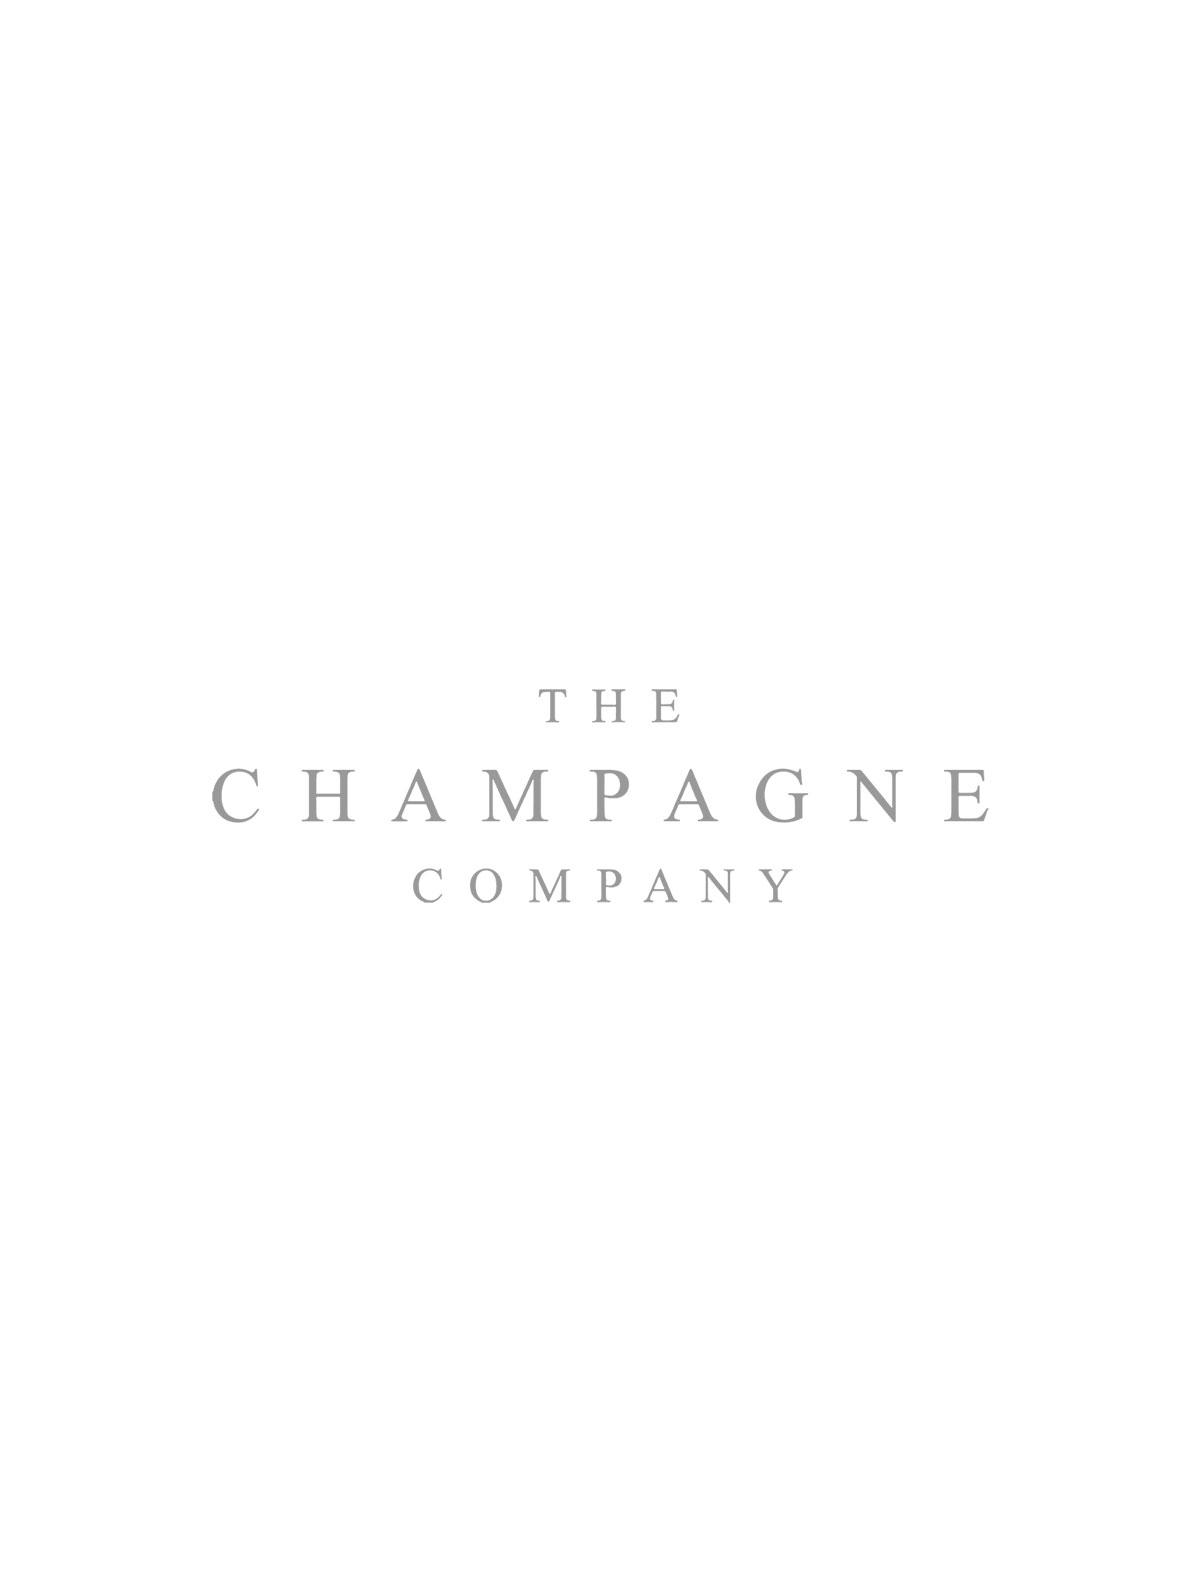 Dom Perignon Rose 1996 Plenitude P2 Vintage Champagne 75CL